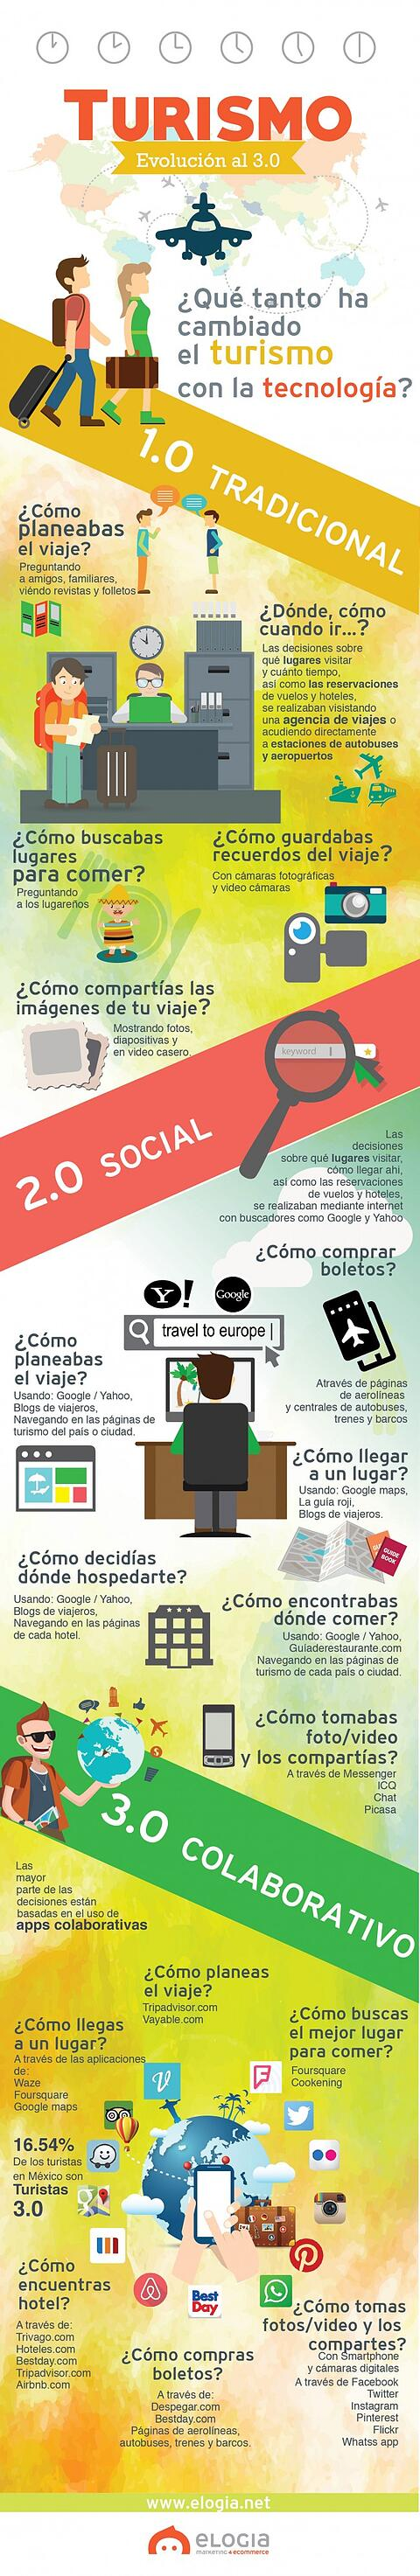 Infografia_turismo-3.0-v4